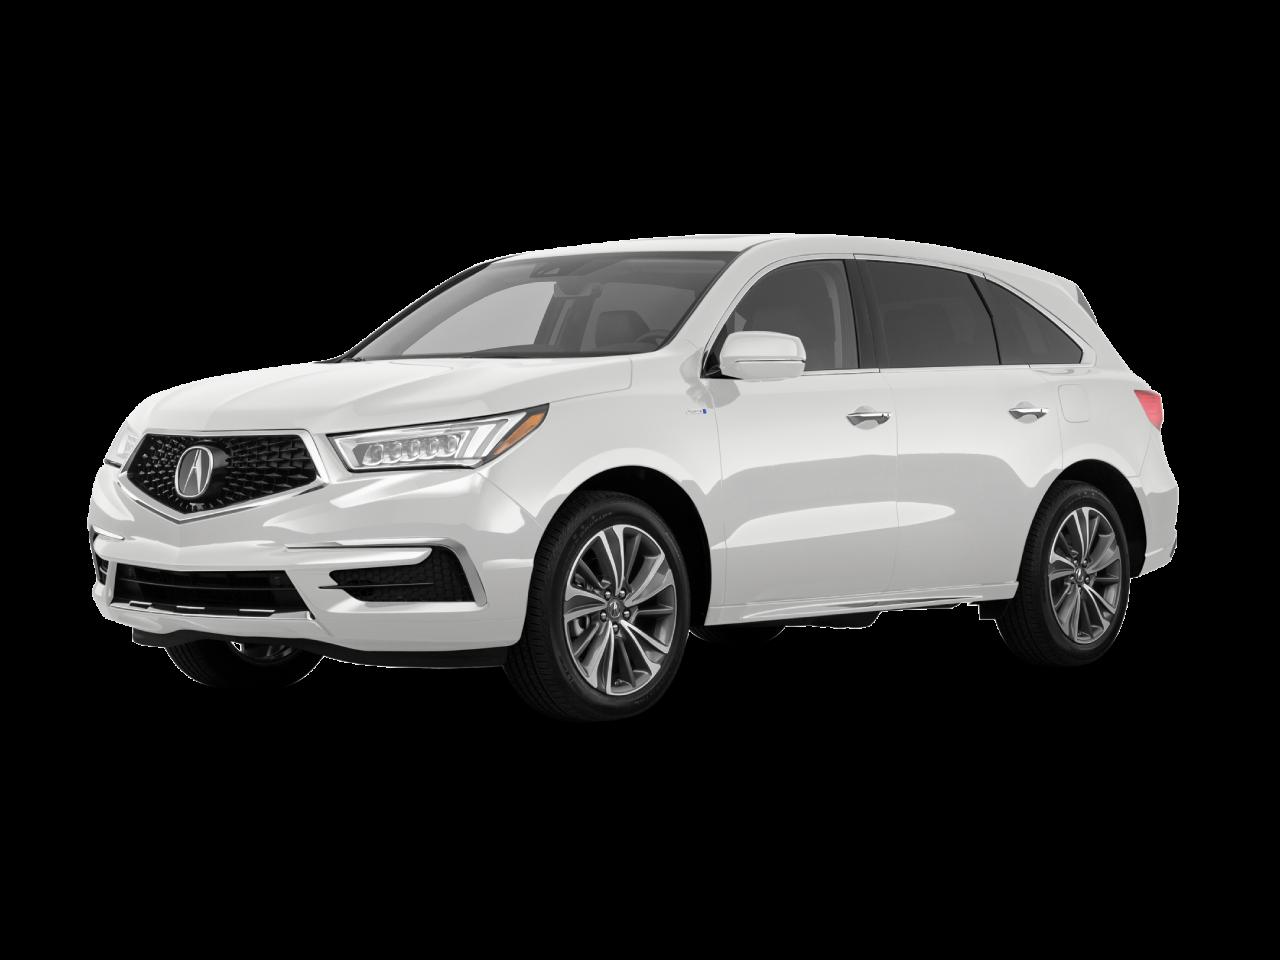 2019 MDX SH-AWD Hybrid